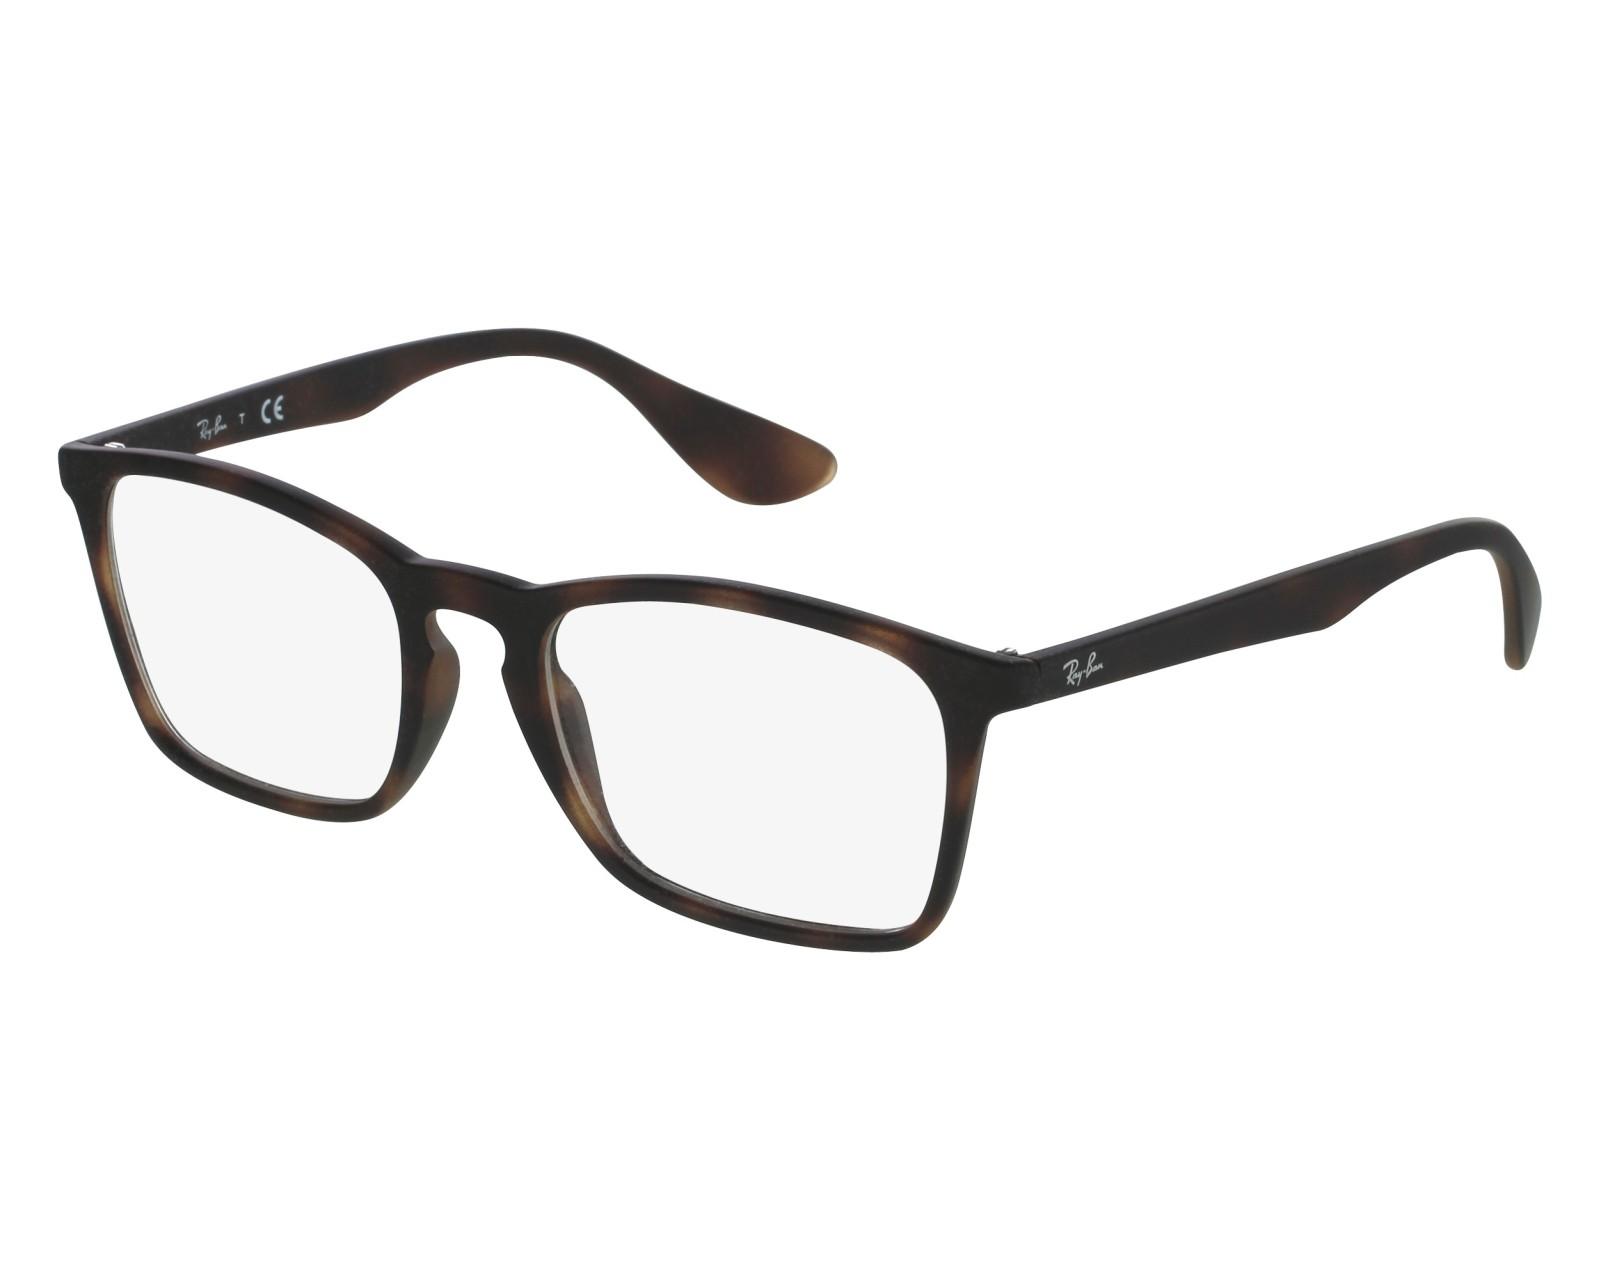 25cf60362dd eyeglasses Ray-Ban RX-7045 5365 53-18 Brown front view